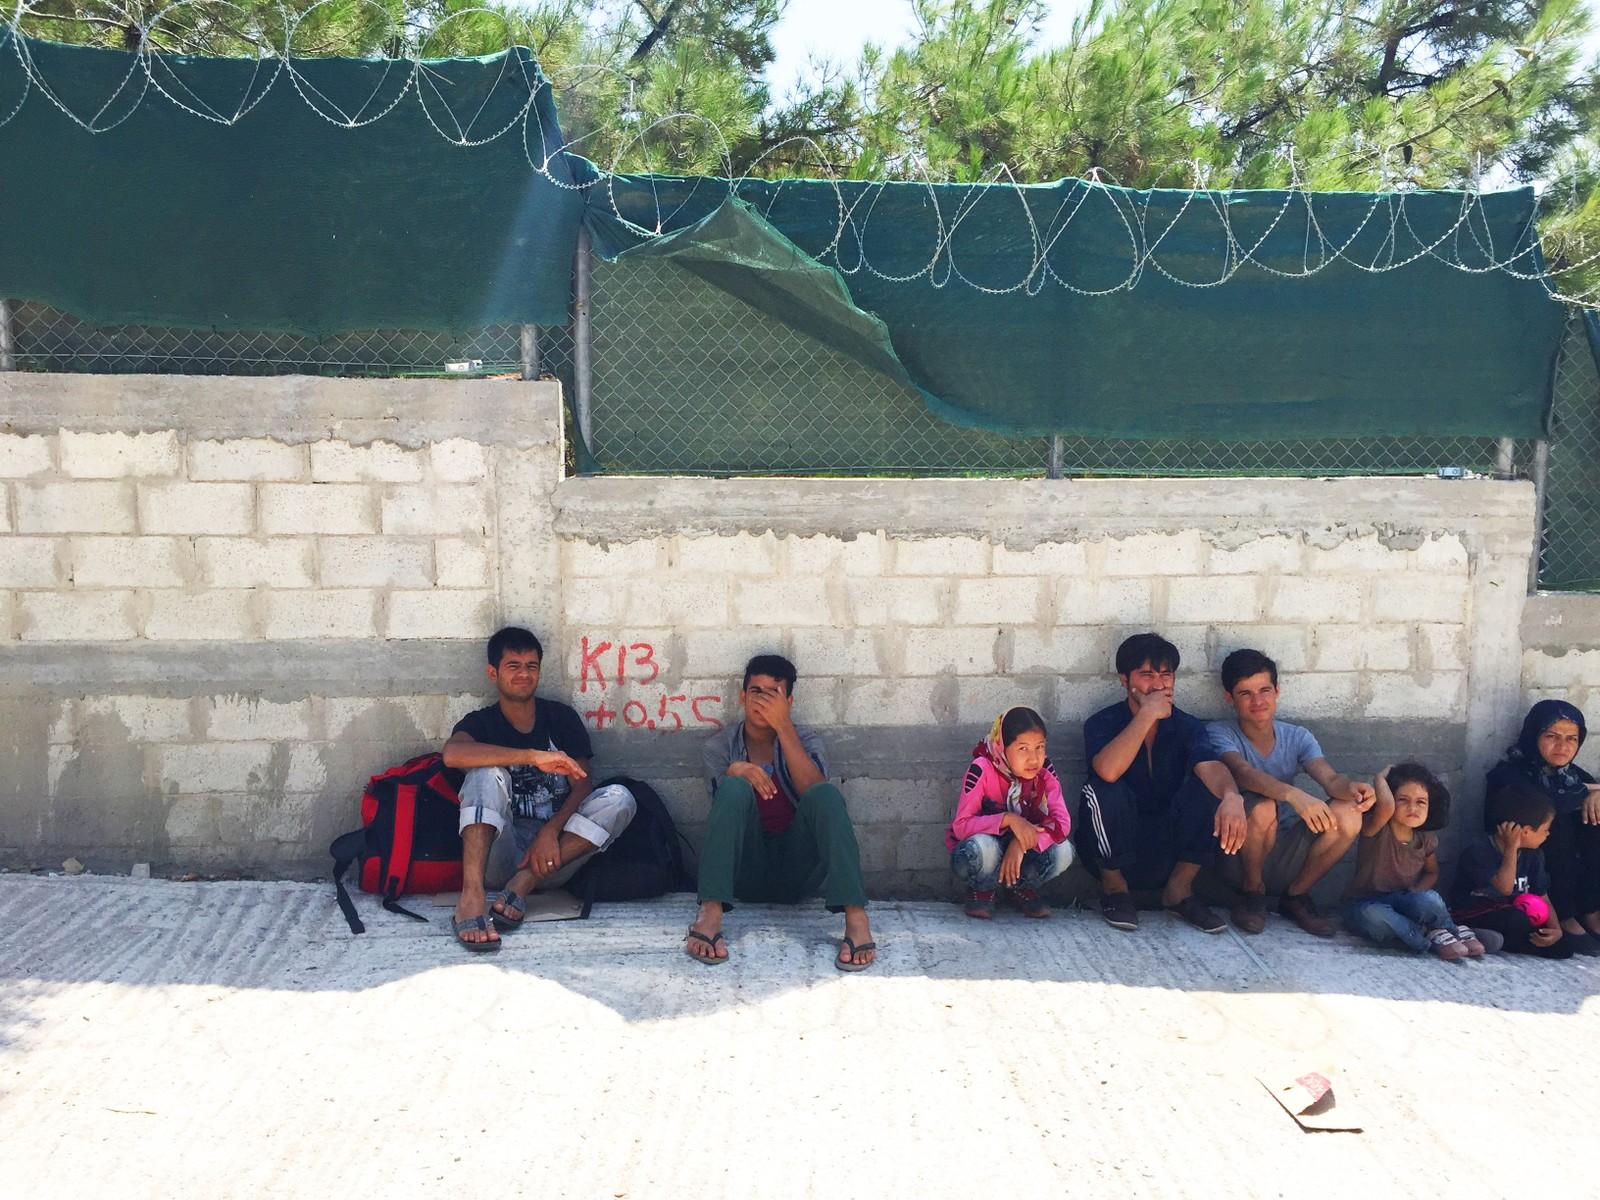 Flyktninger hviler i skyggen på Lesvos.